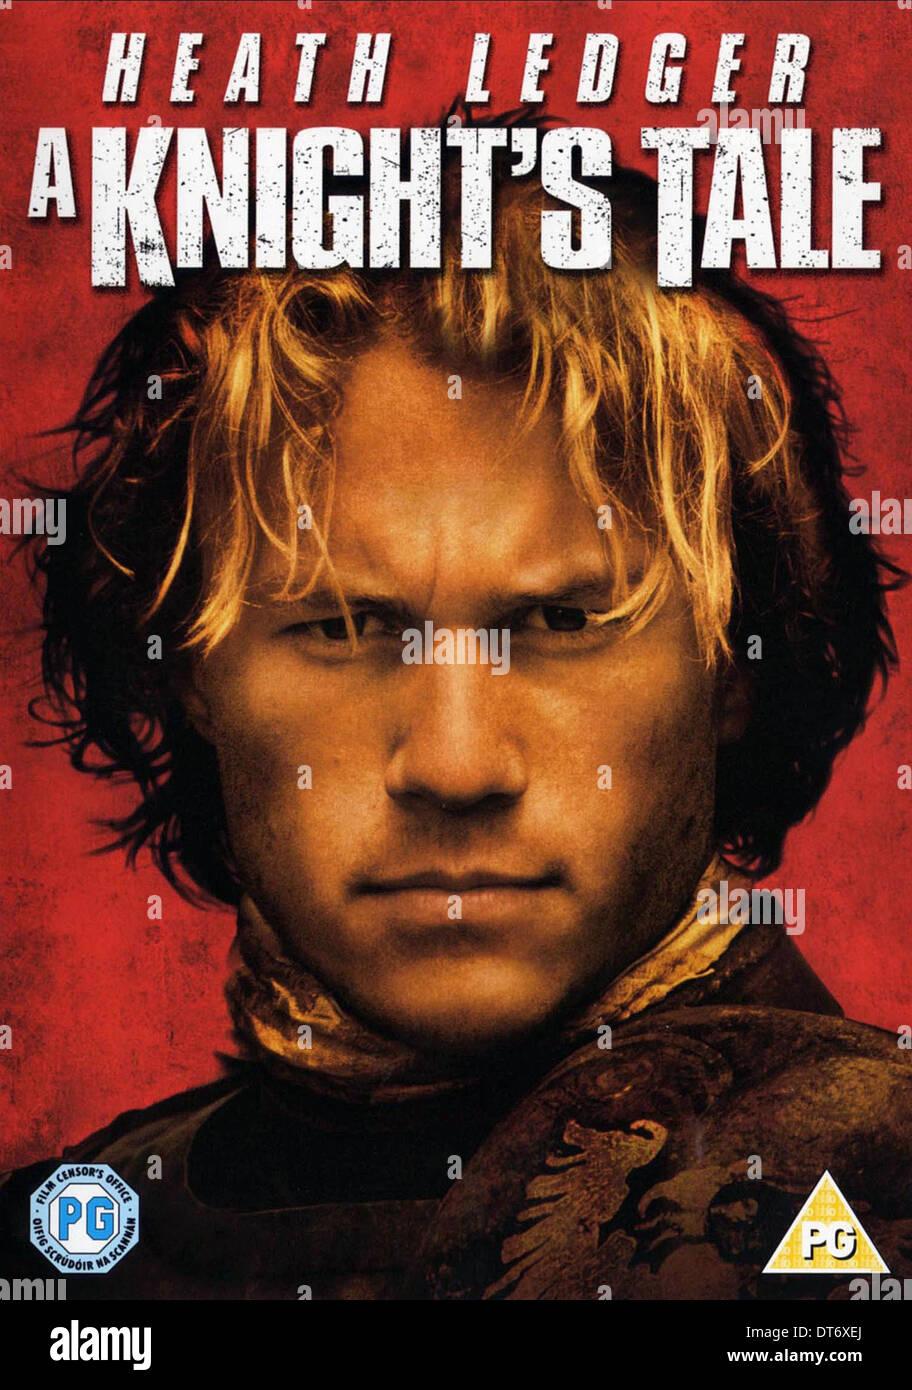 HEATH LEDGER FILM POSTER A KNIGHT'S TALE (2001 Stock Photo ...